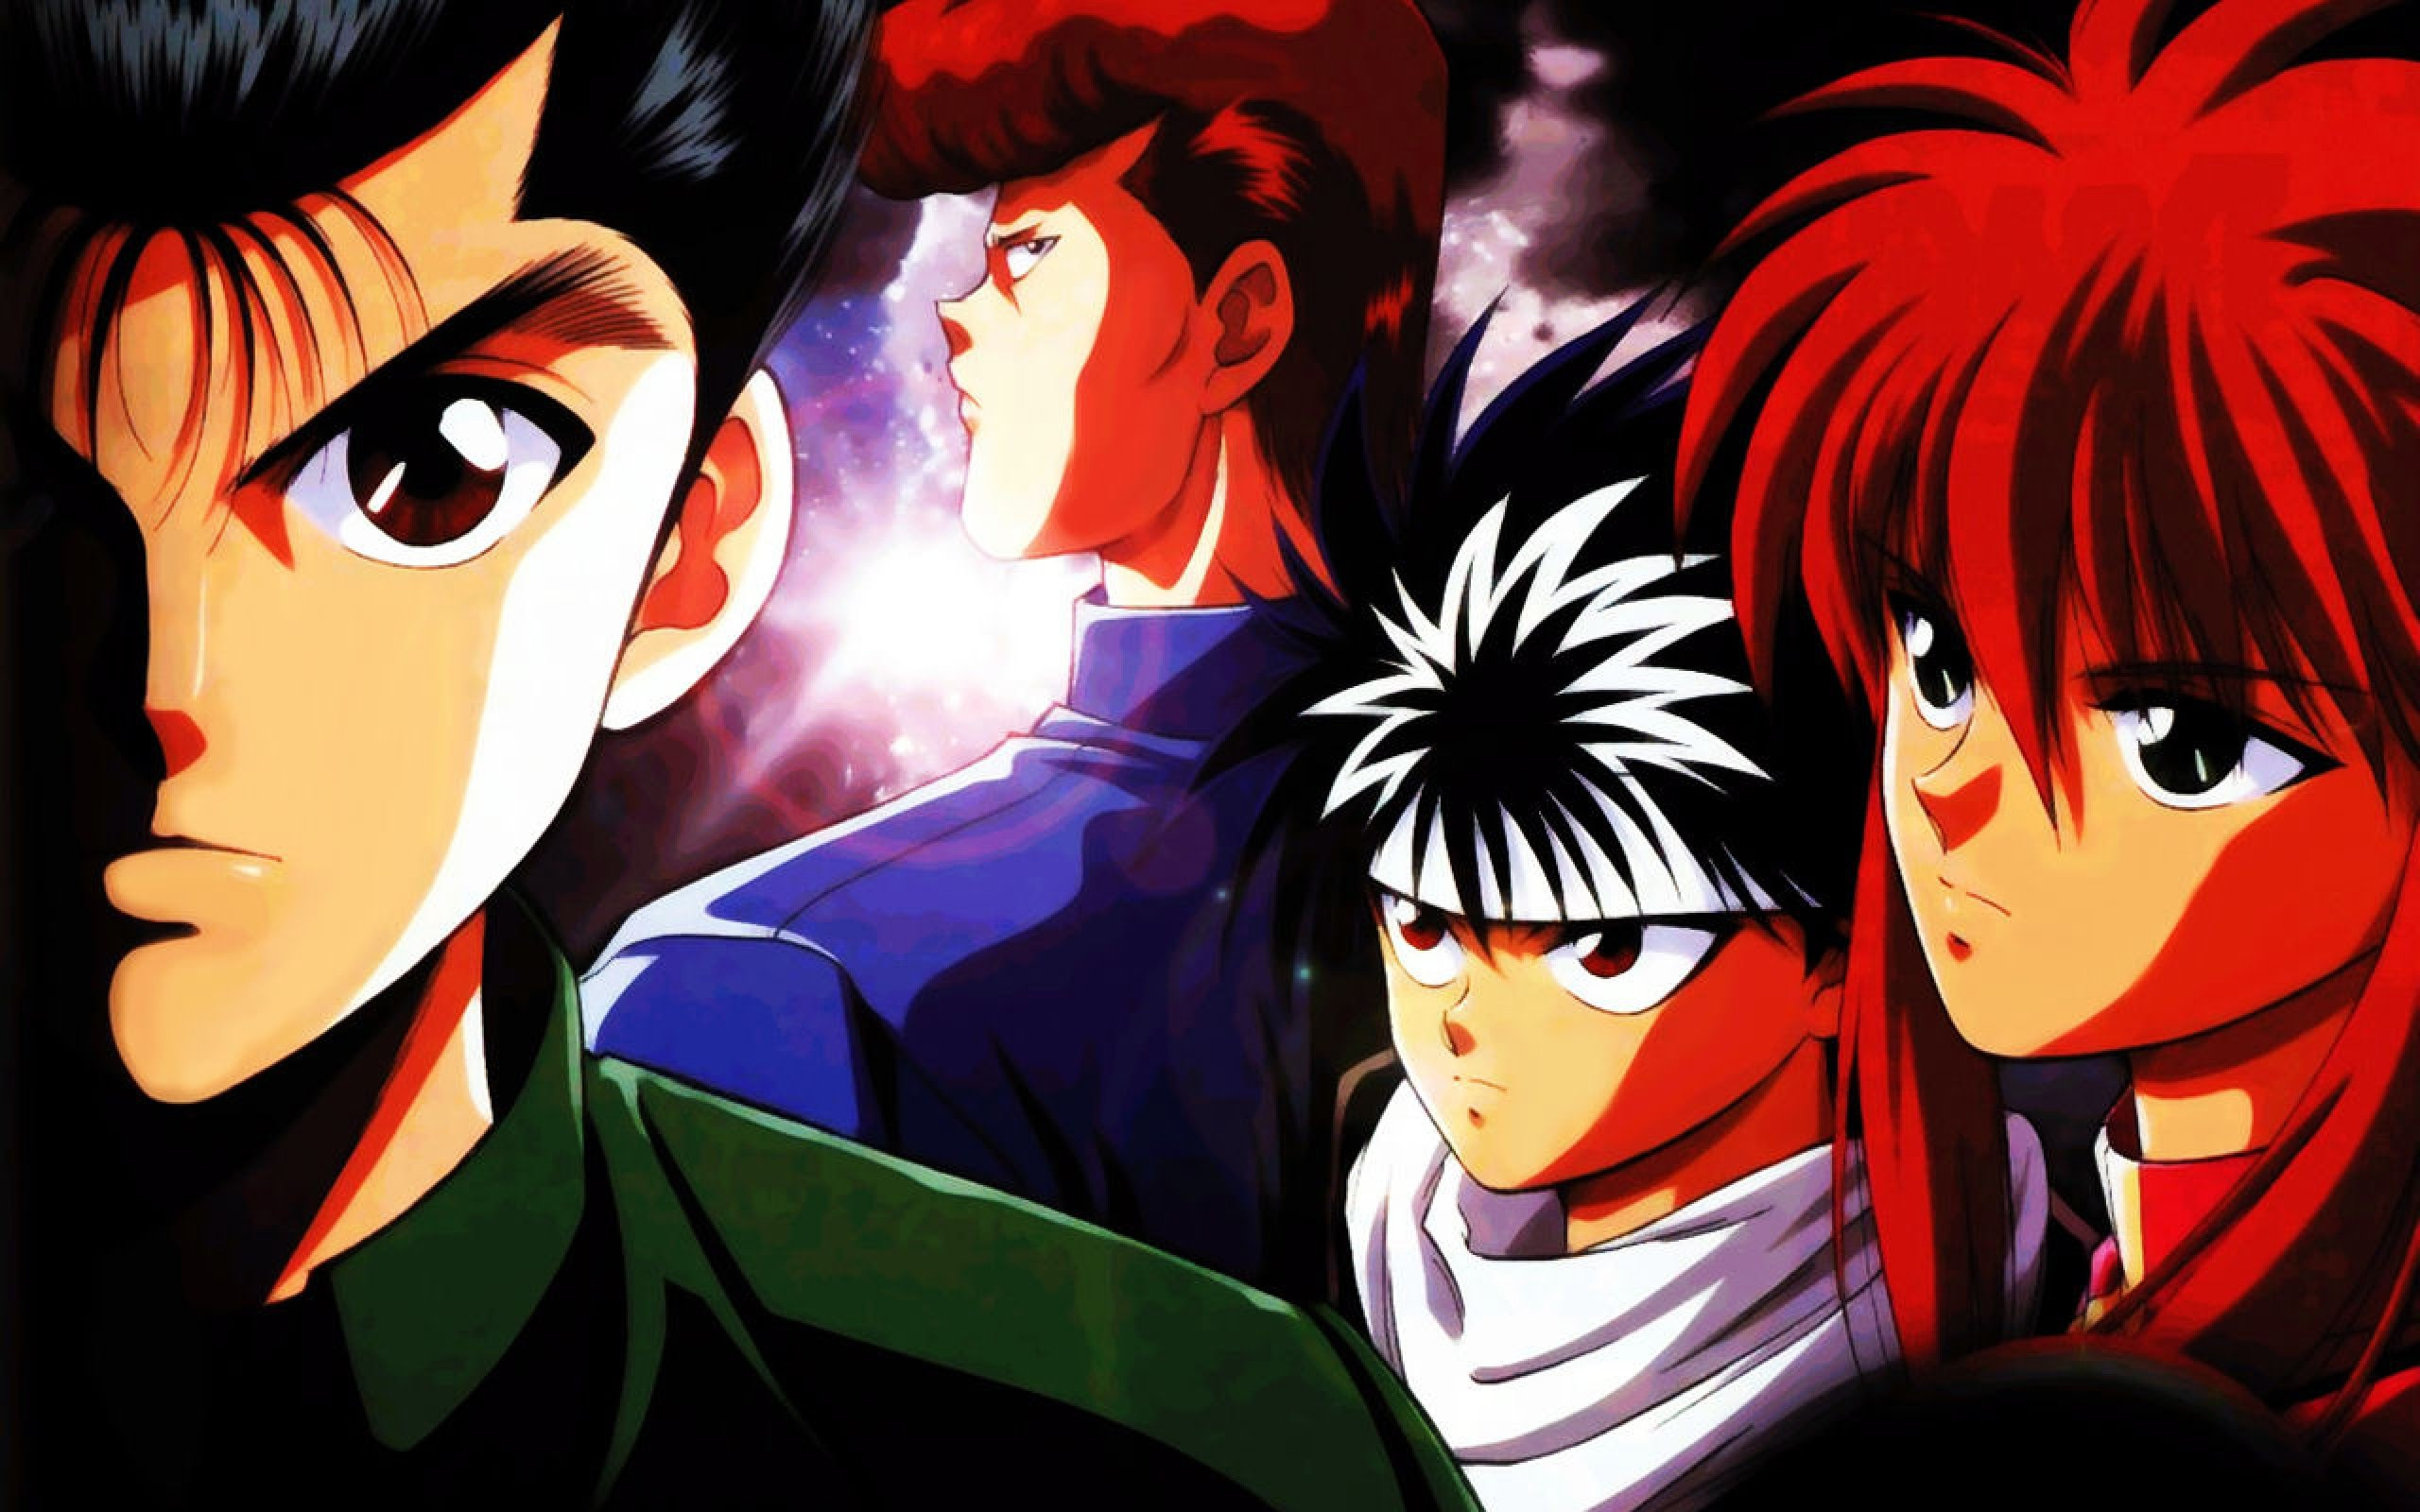 Yu Yu Hakusho Wallpapers Anime Hq Yu Yu Hakusho Pictures 4k